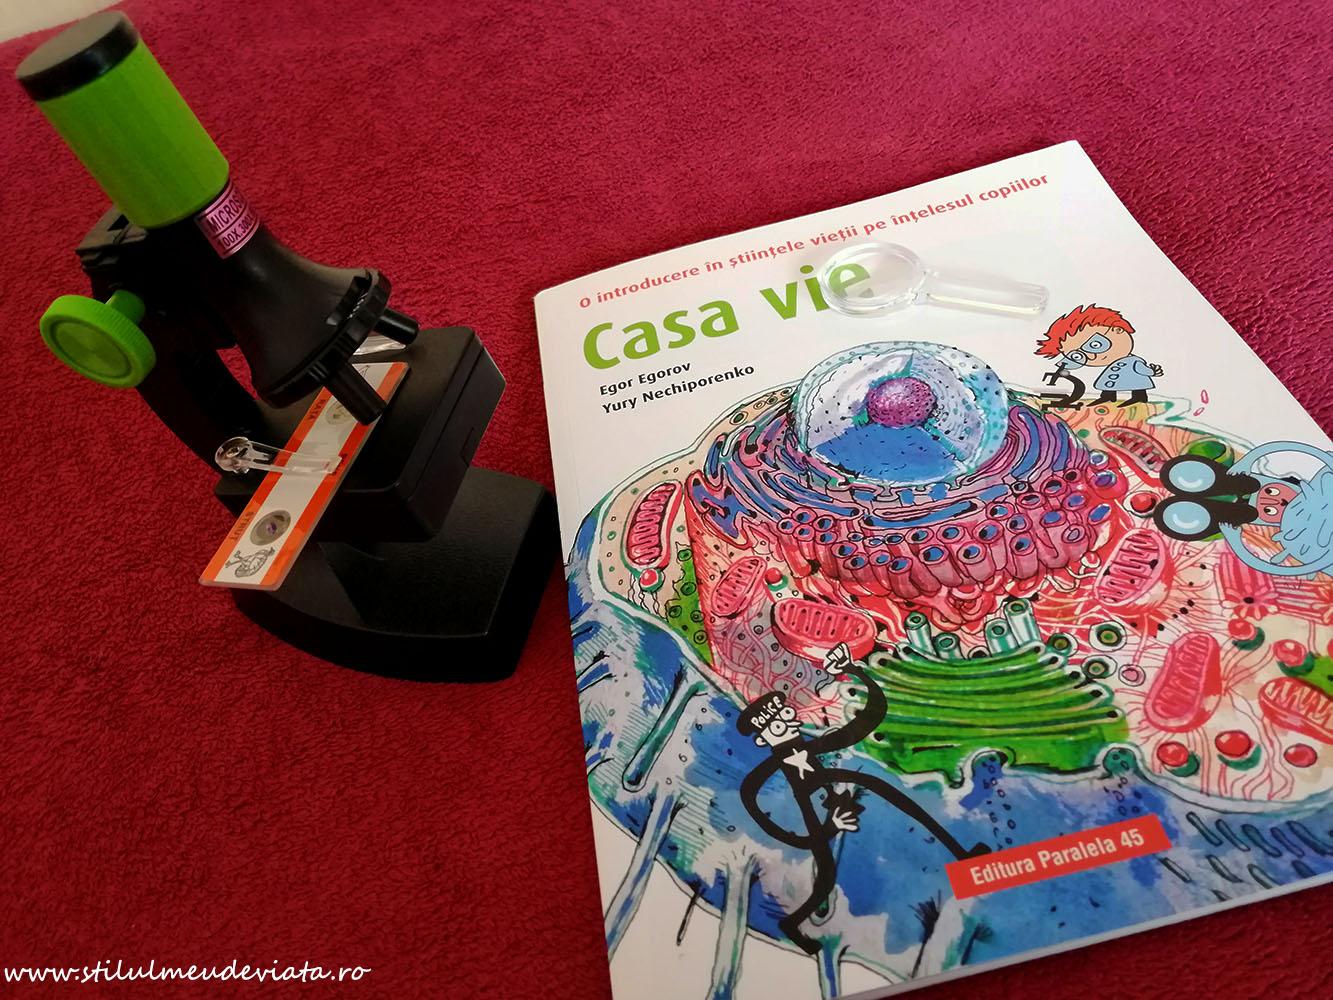 Casa vie, Editura Paralela 45